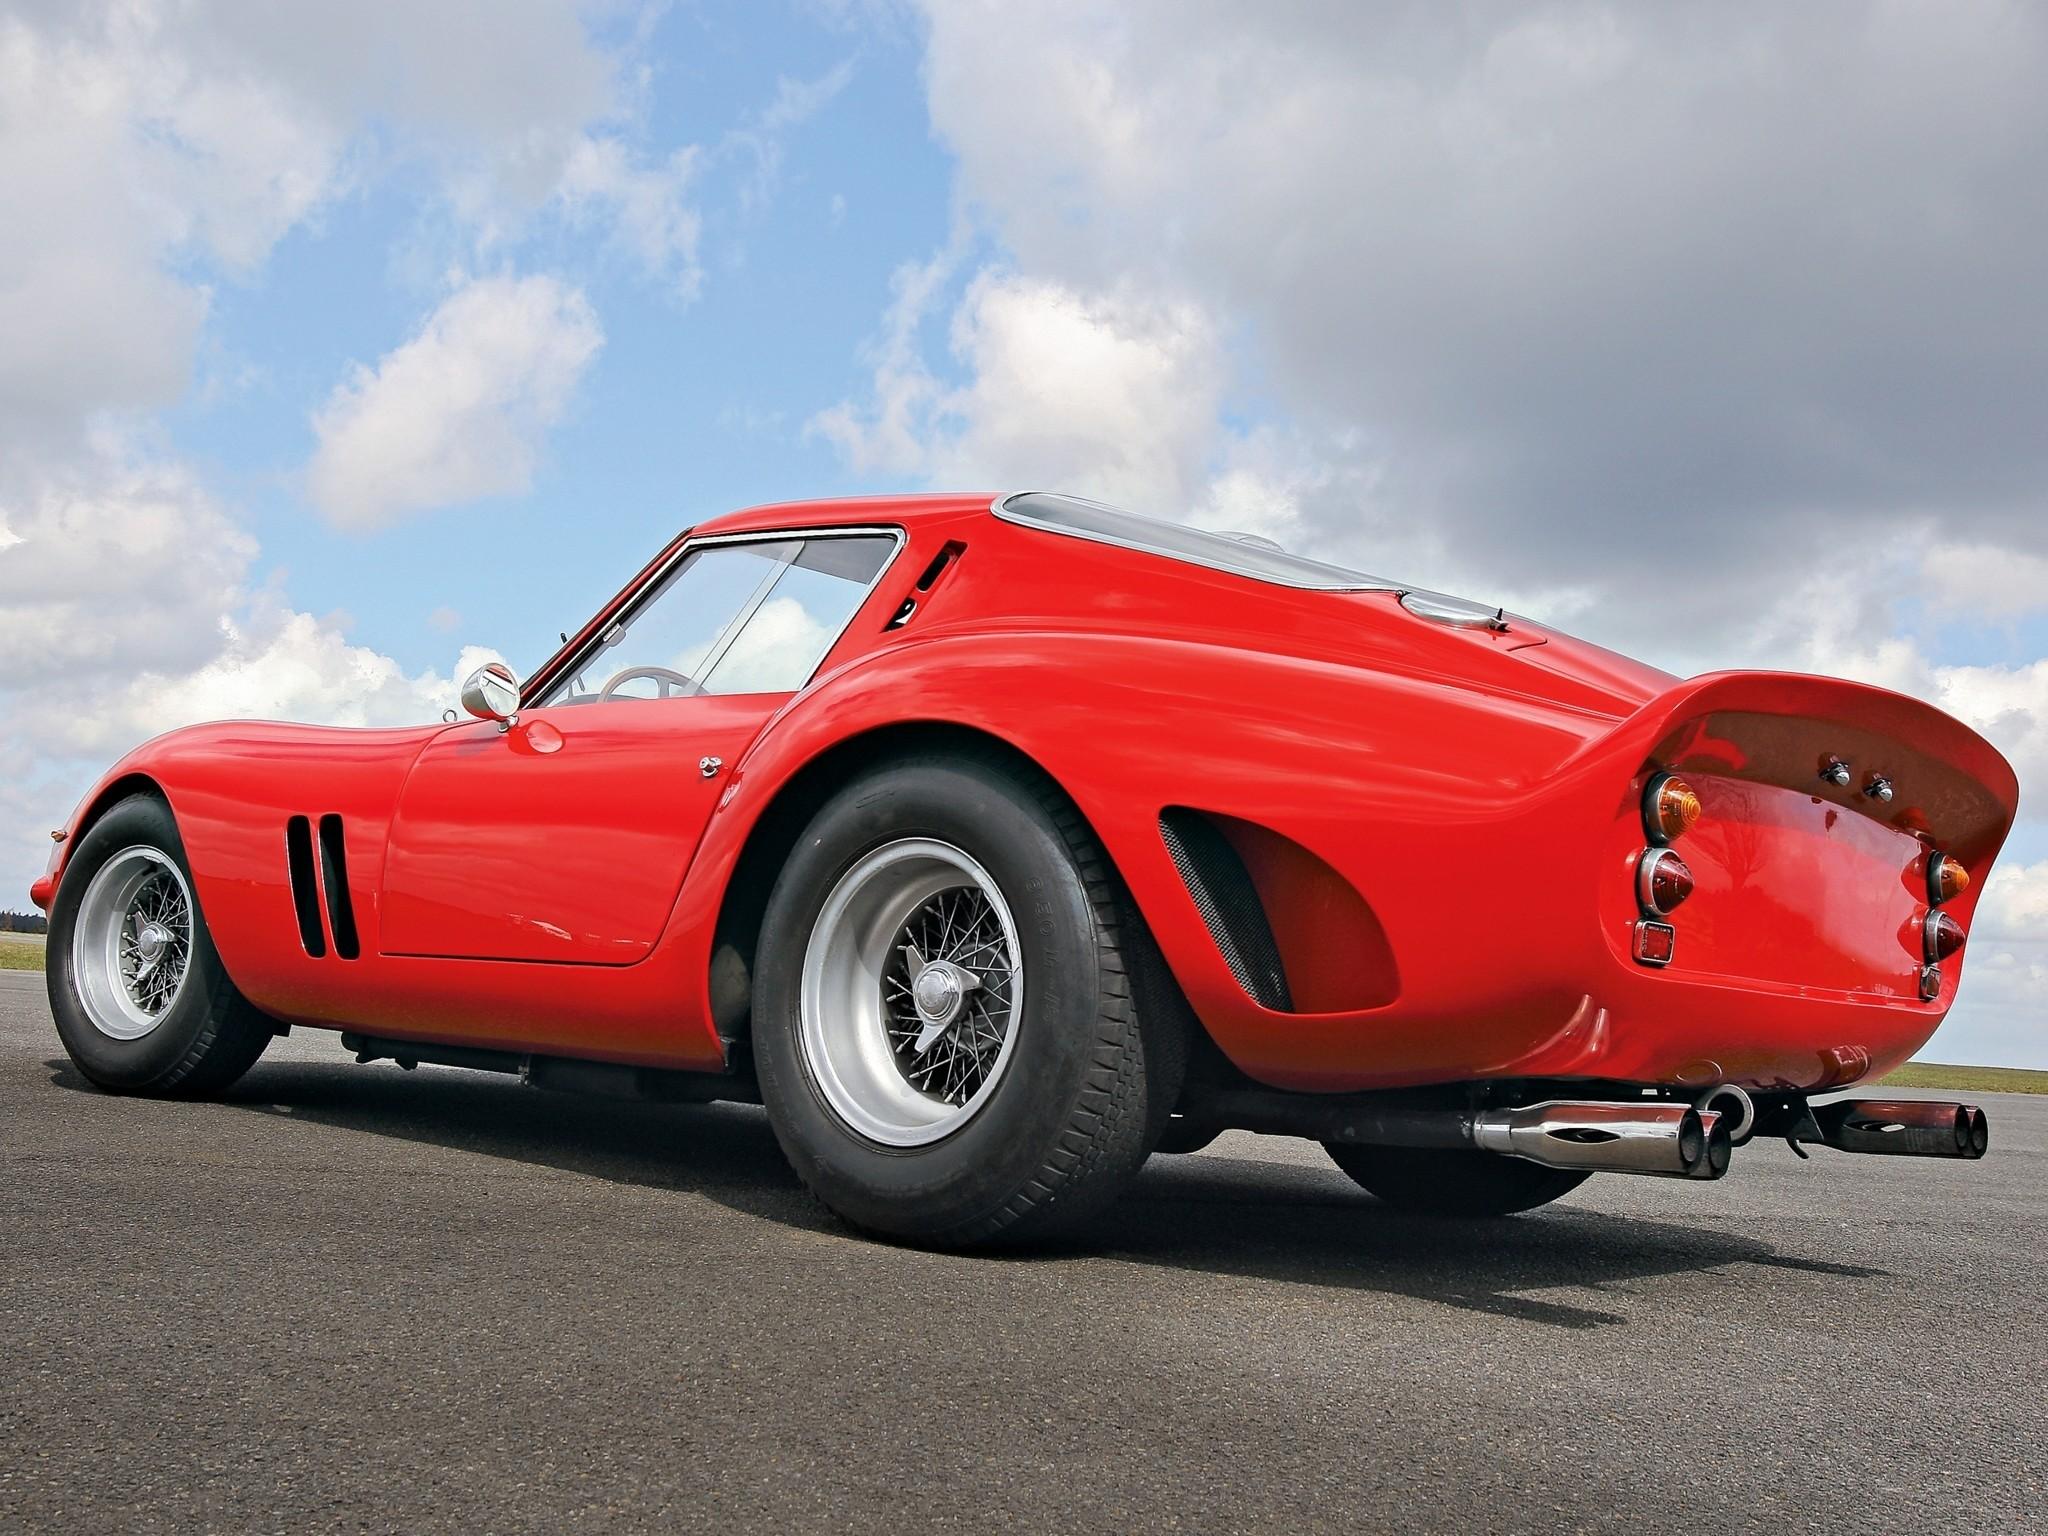 Ferrari 250 Gto Wallpapers Hd